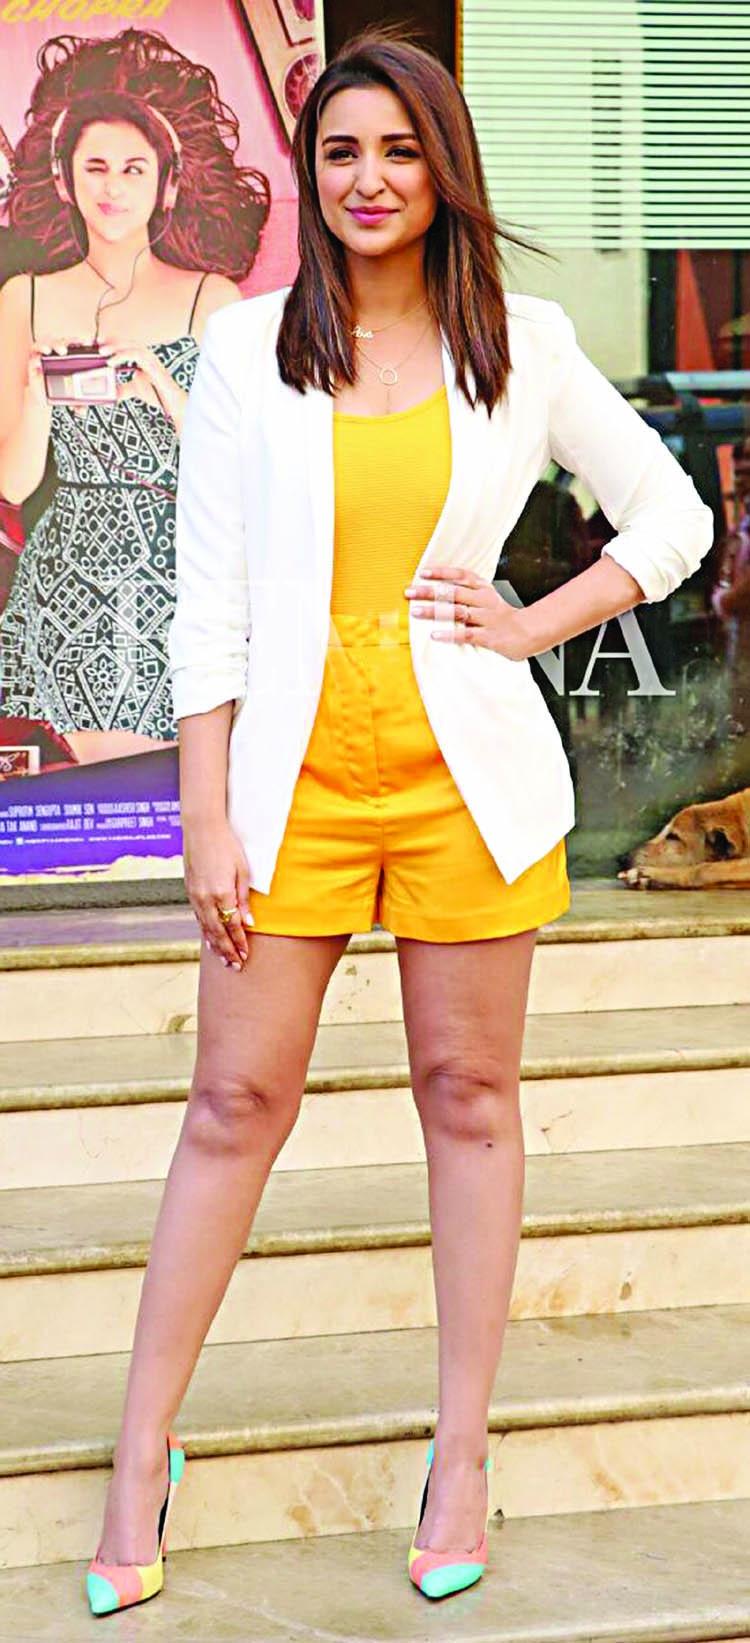 Parineeti Chopra discloses source of her industry gossip